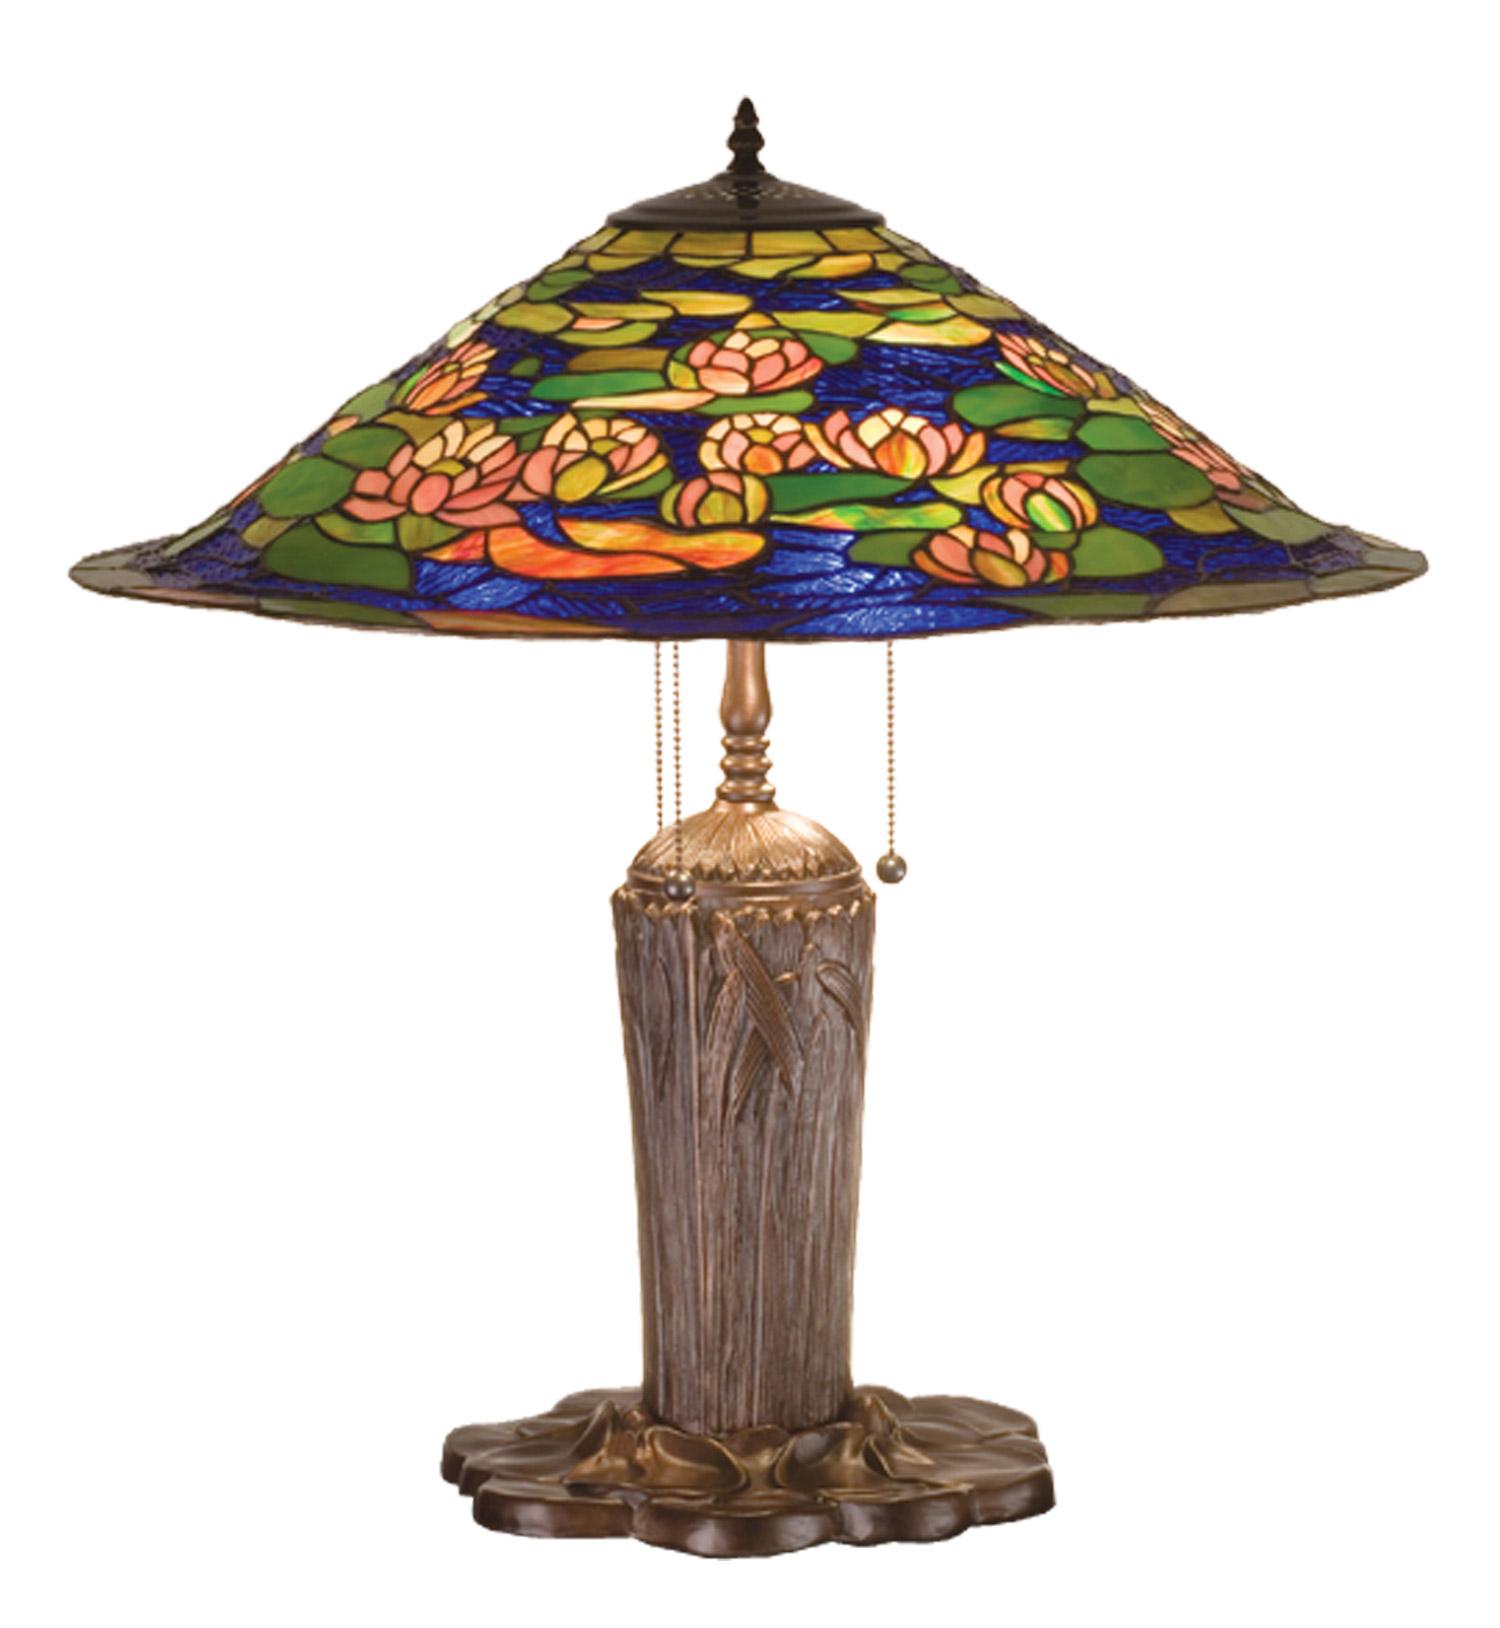 Meyda 32300 Tiffany Pond Lily Table Lamp